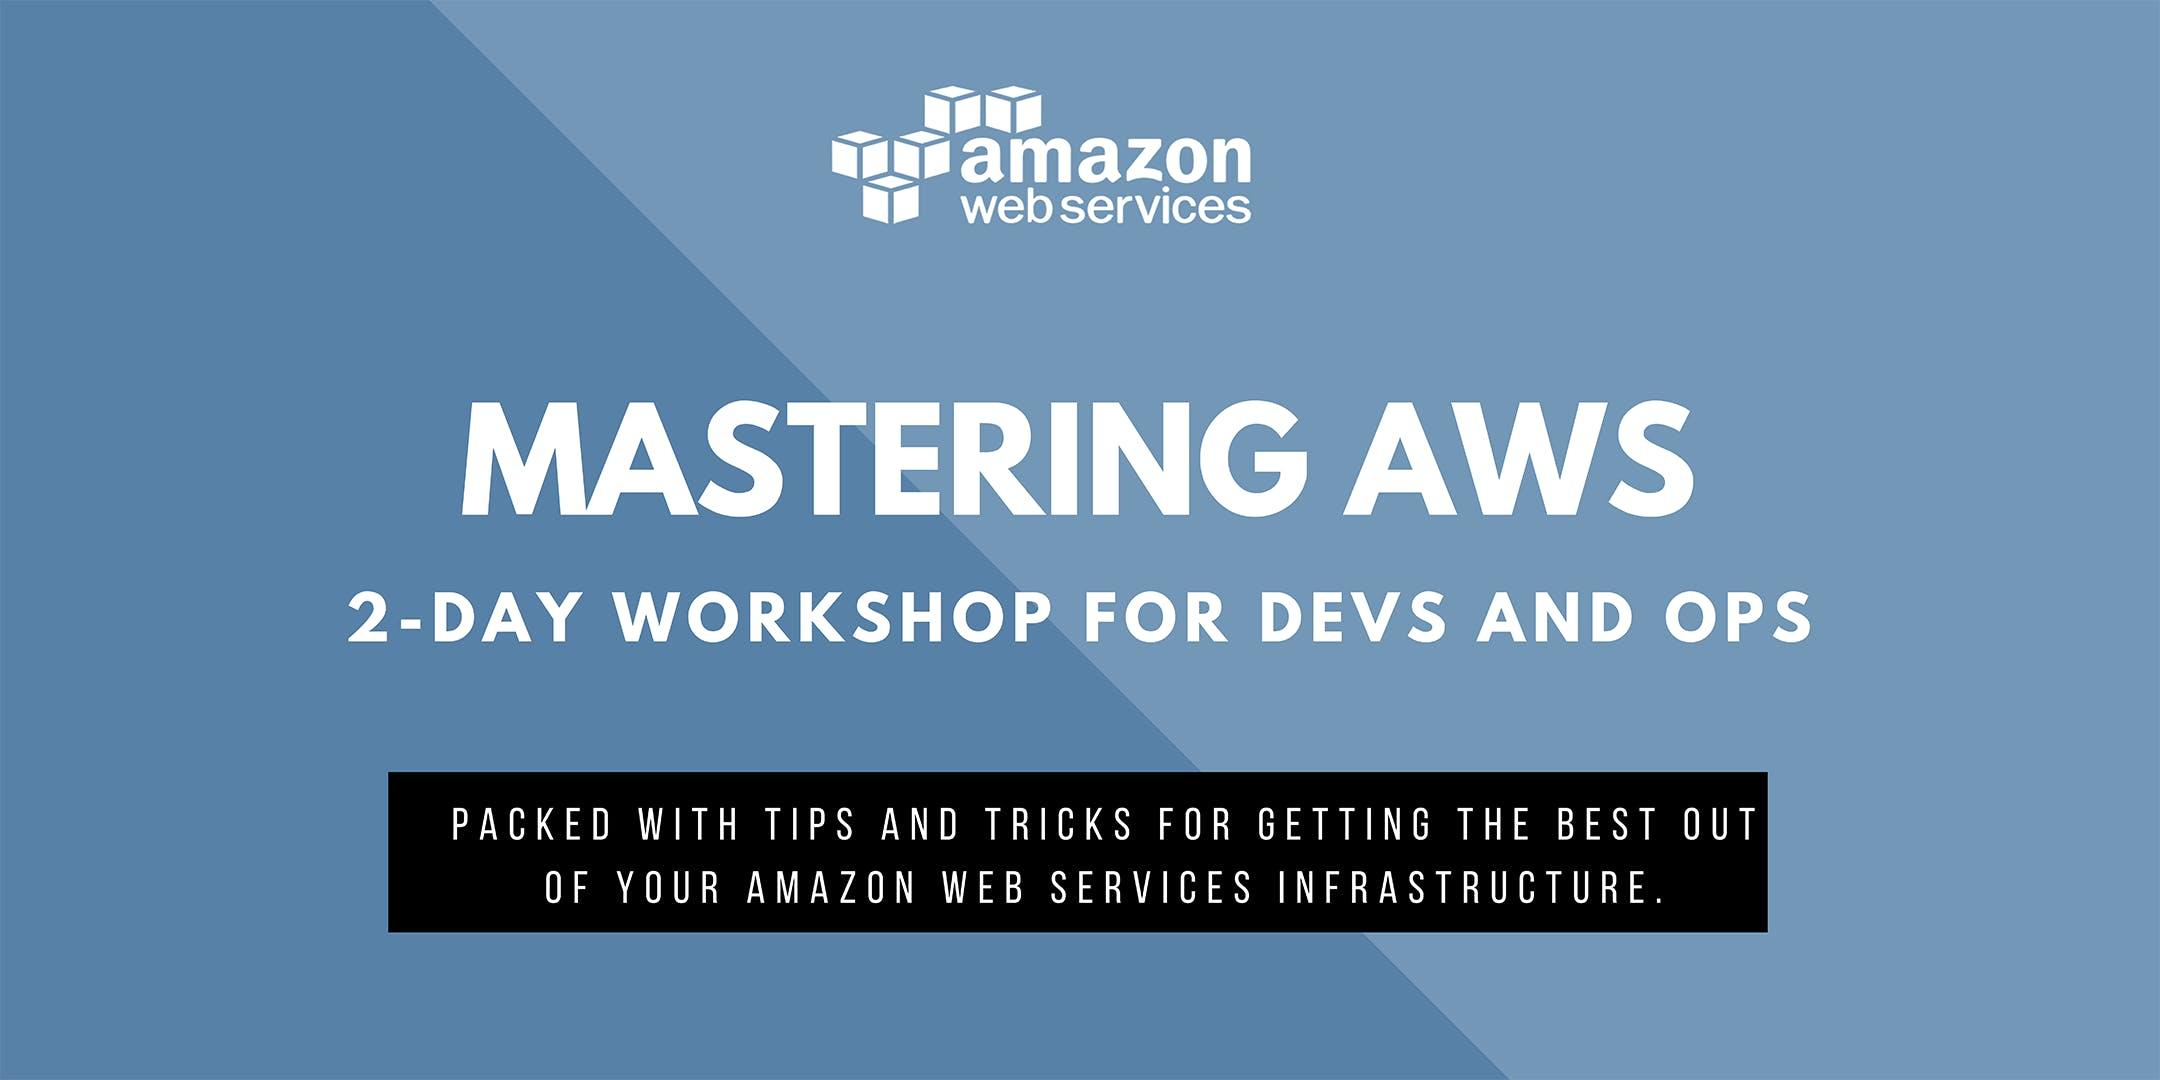 TOP Mastering Amazon Web Services (Dsseldorf)